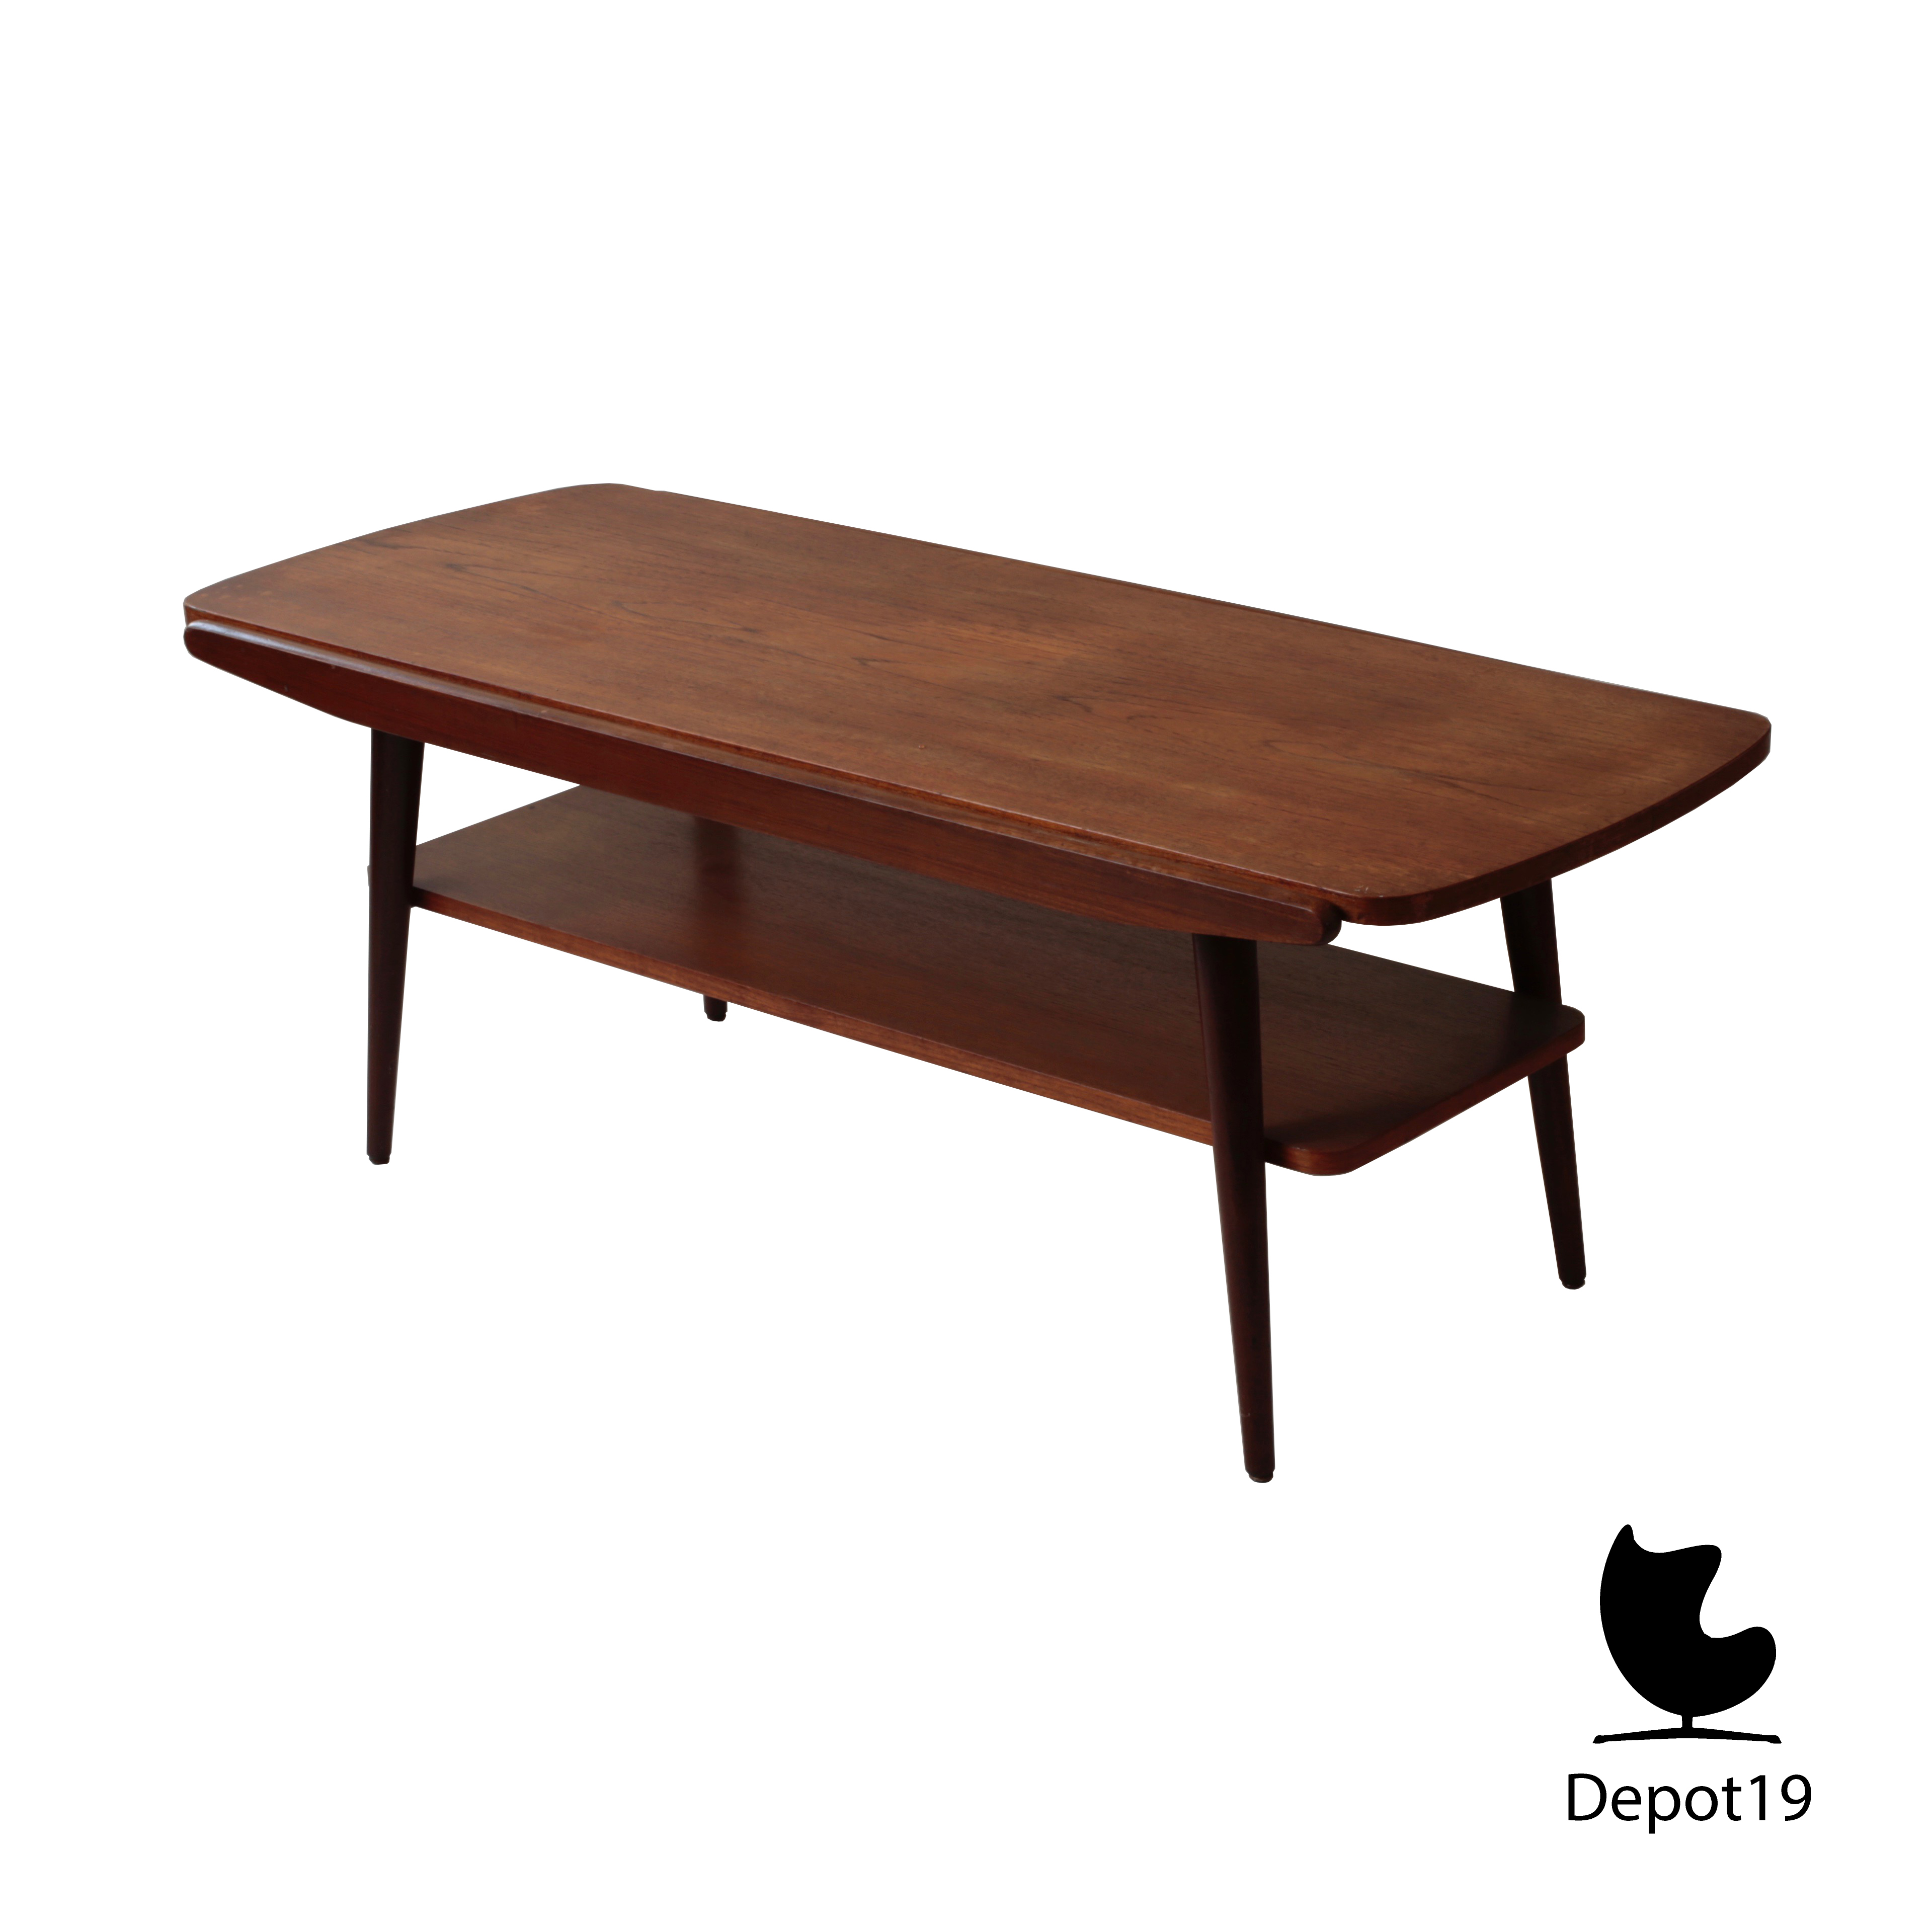 Louis van teeffelen stijl teak salontafel 50s depot 19 for 60s style coffee table